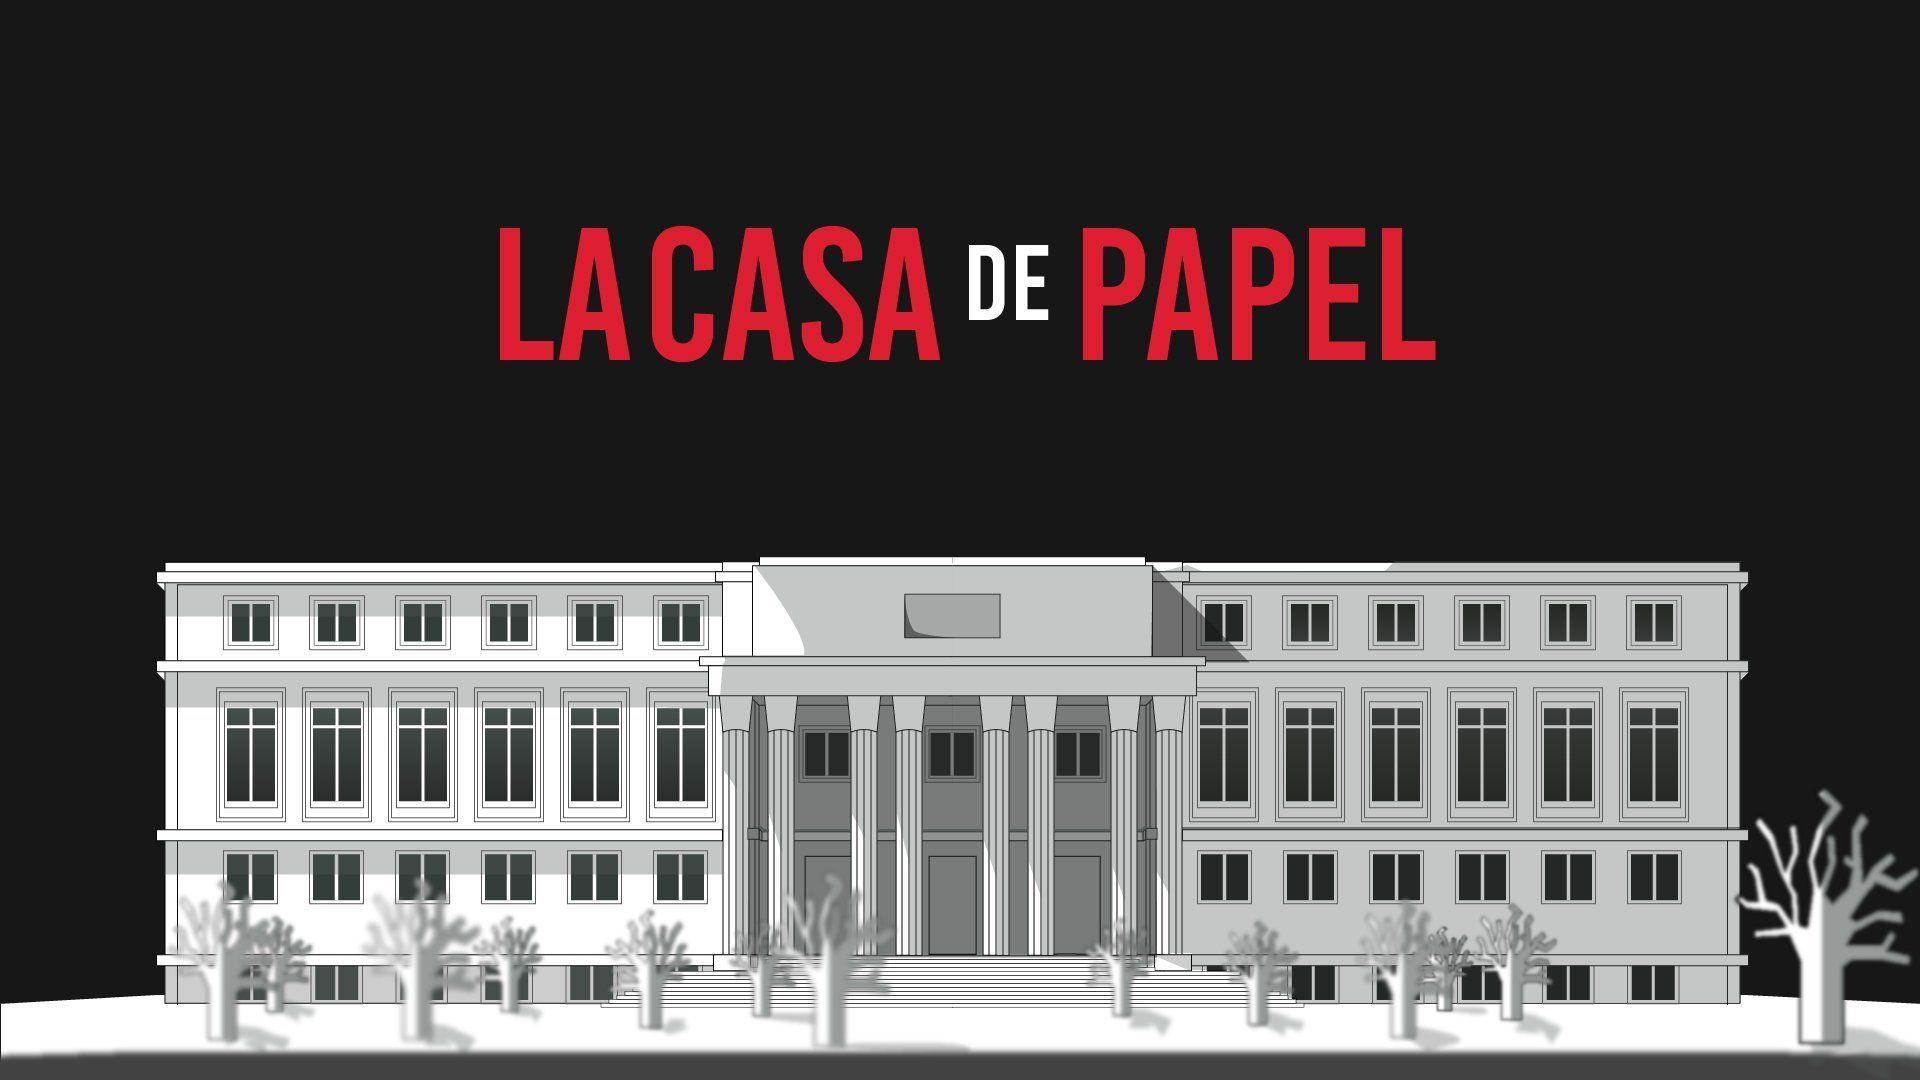 Programa De Tv La Casa De Papel Papel De Parede Casa De Papelao